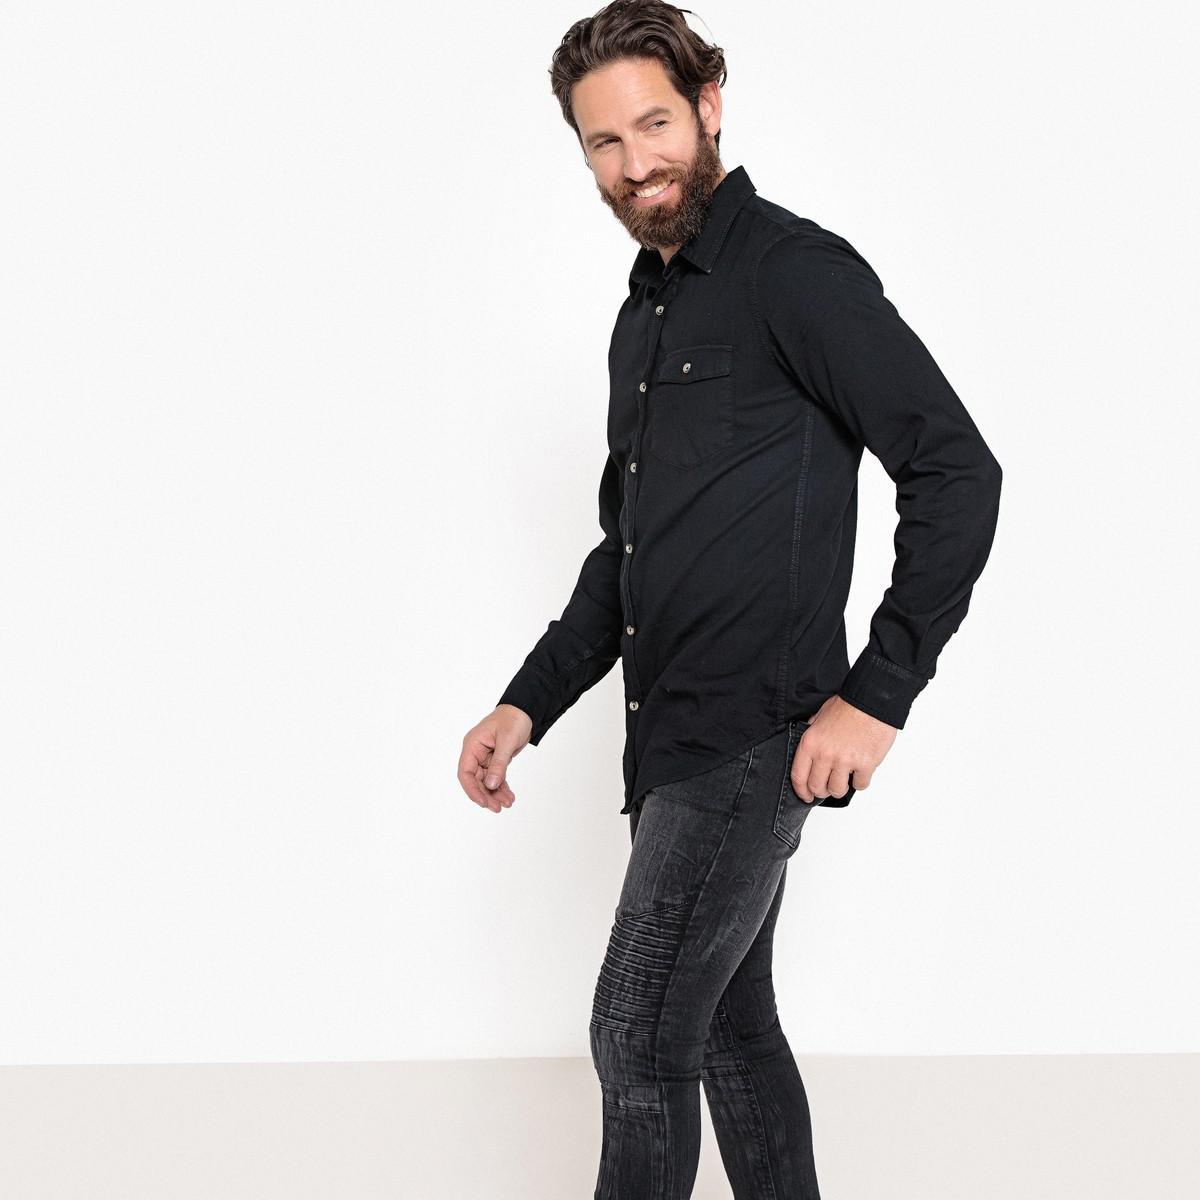 fe70a090ef Lyst - La Redoute Long-sleeved Straight Cut Shirt in Black for Men